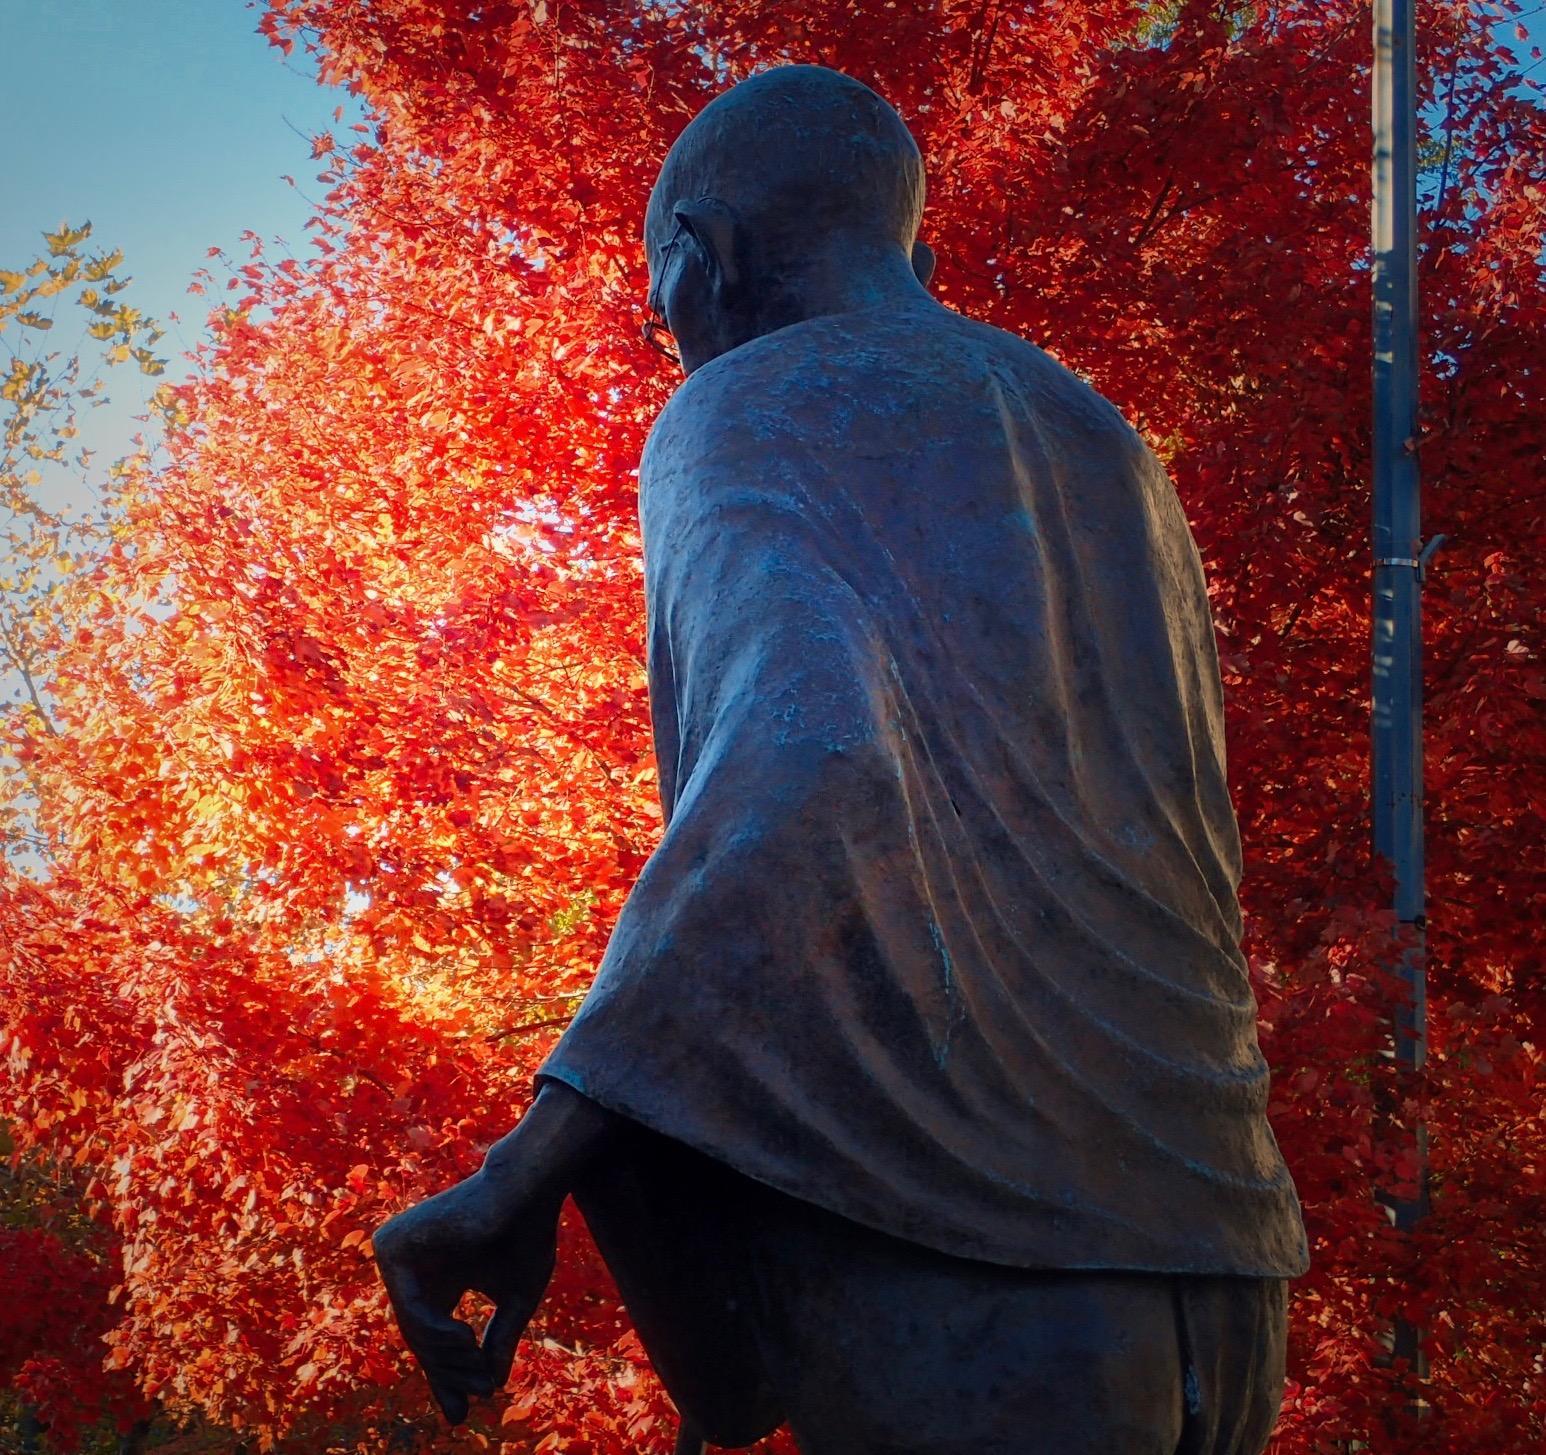 http://thedigitalstory.com/2017/11/21/Ghandi-in-DS.jpg